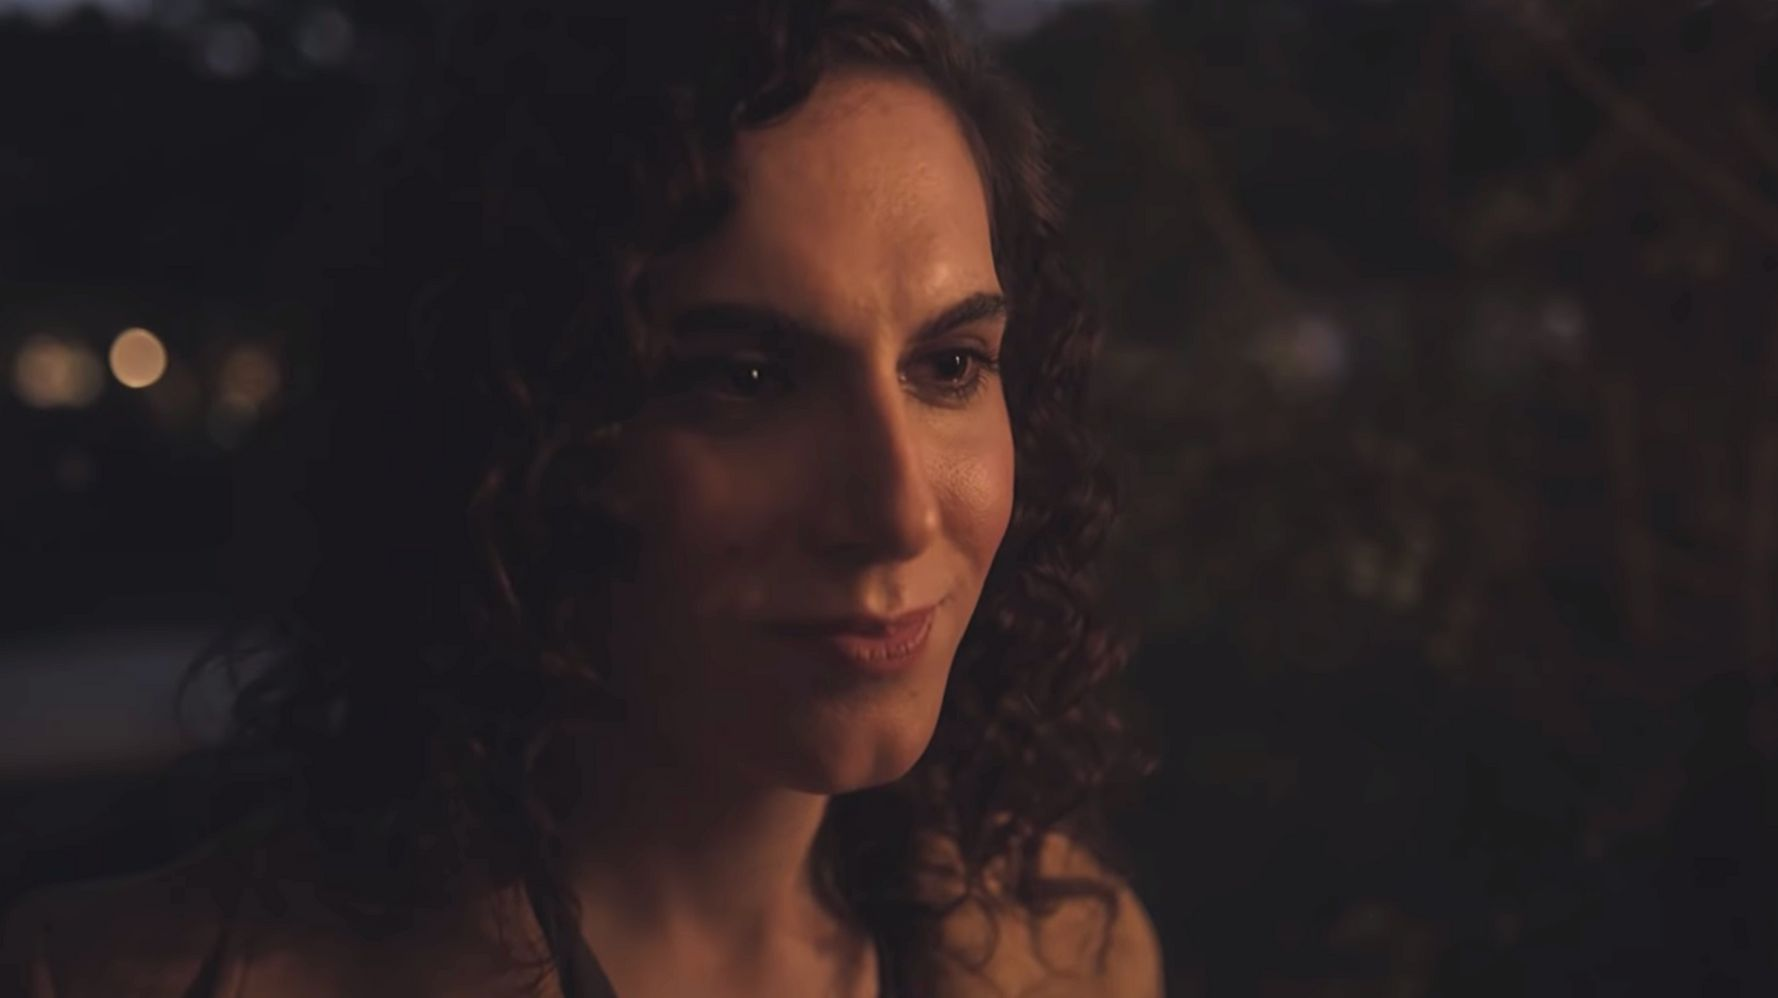 Pantene Holiday Ad Campaign Celebrates Transgender Family Acceptance